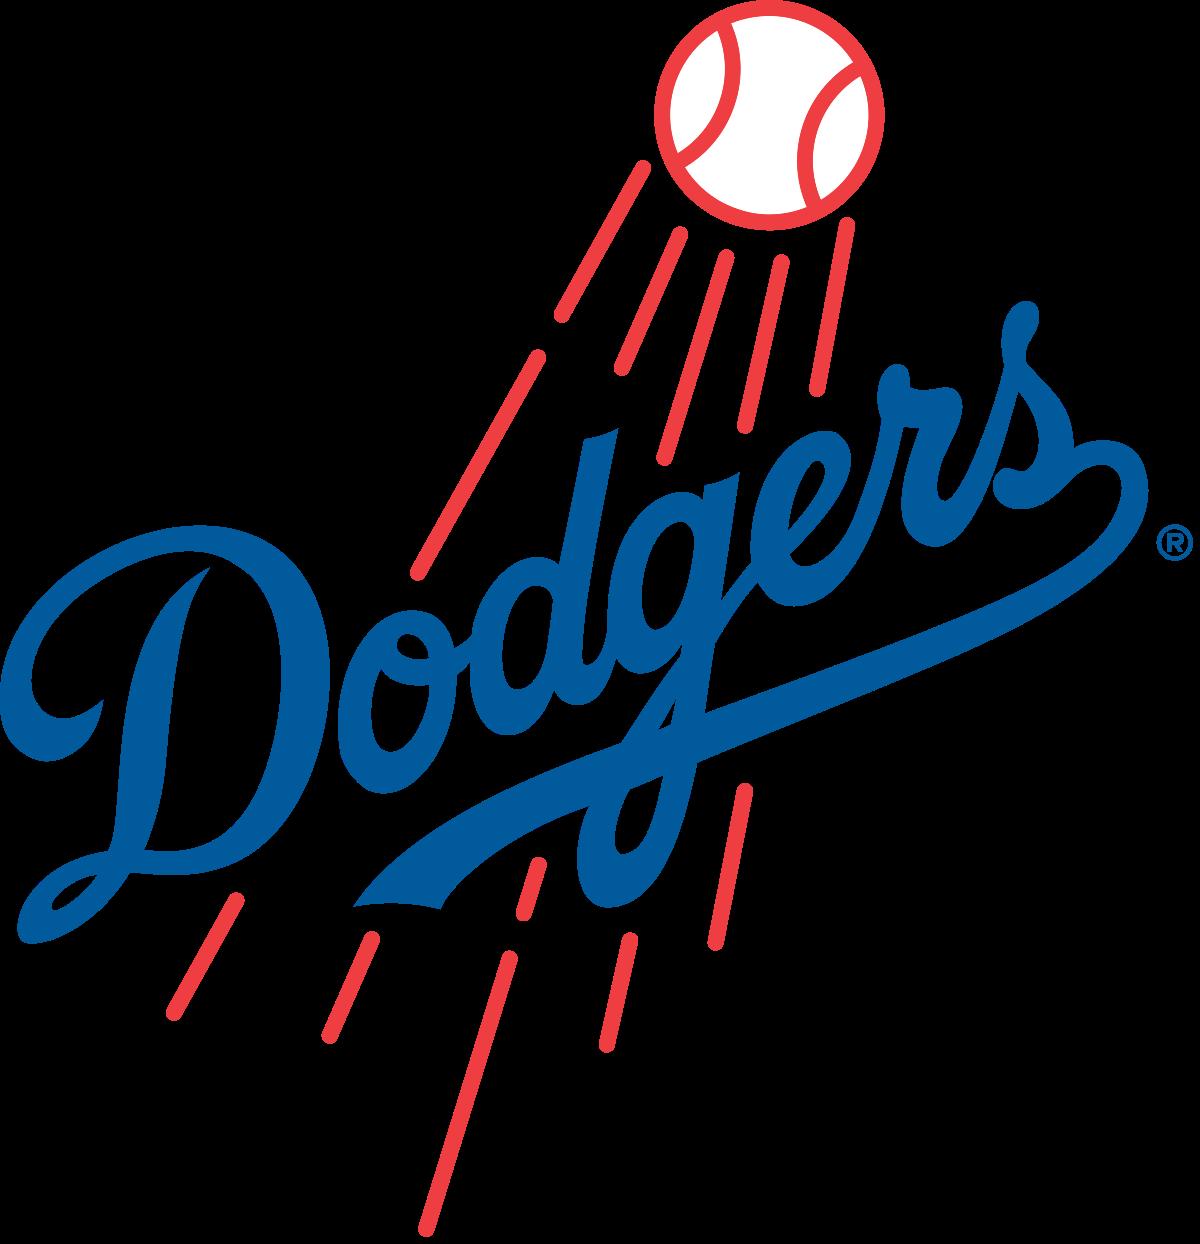 Los Angeles Dodgers.